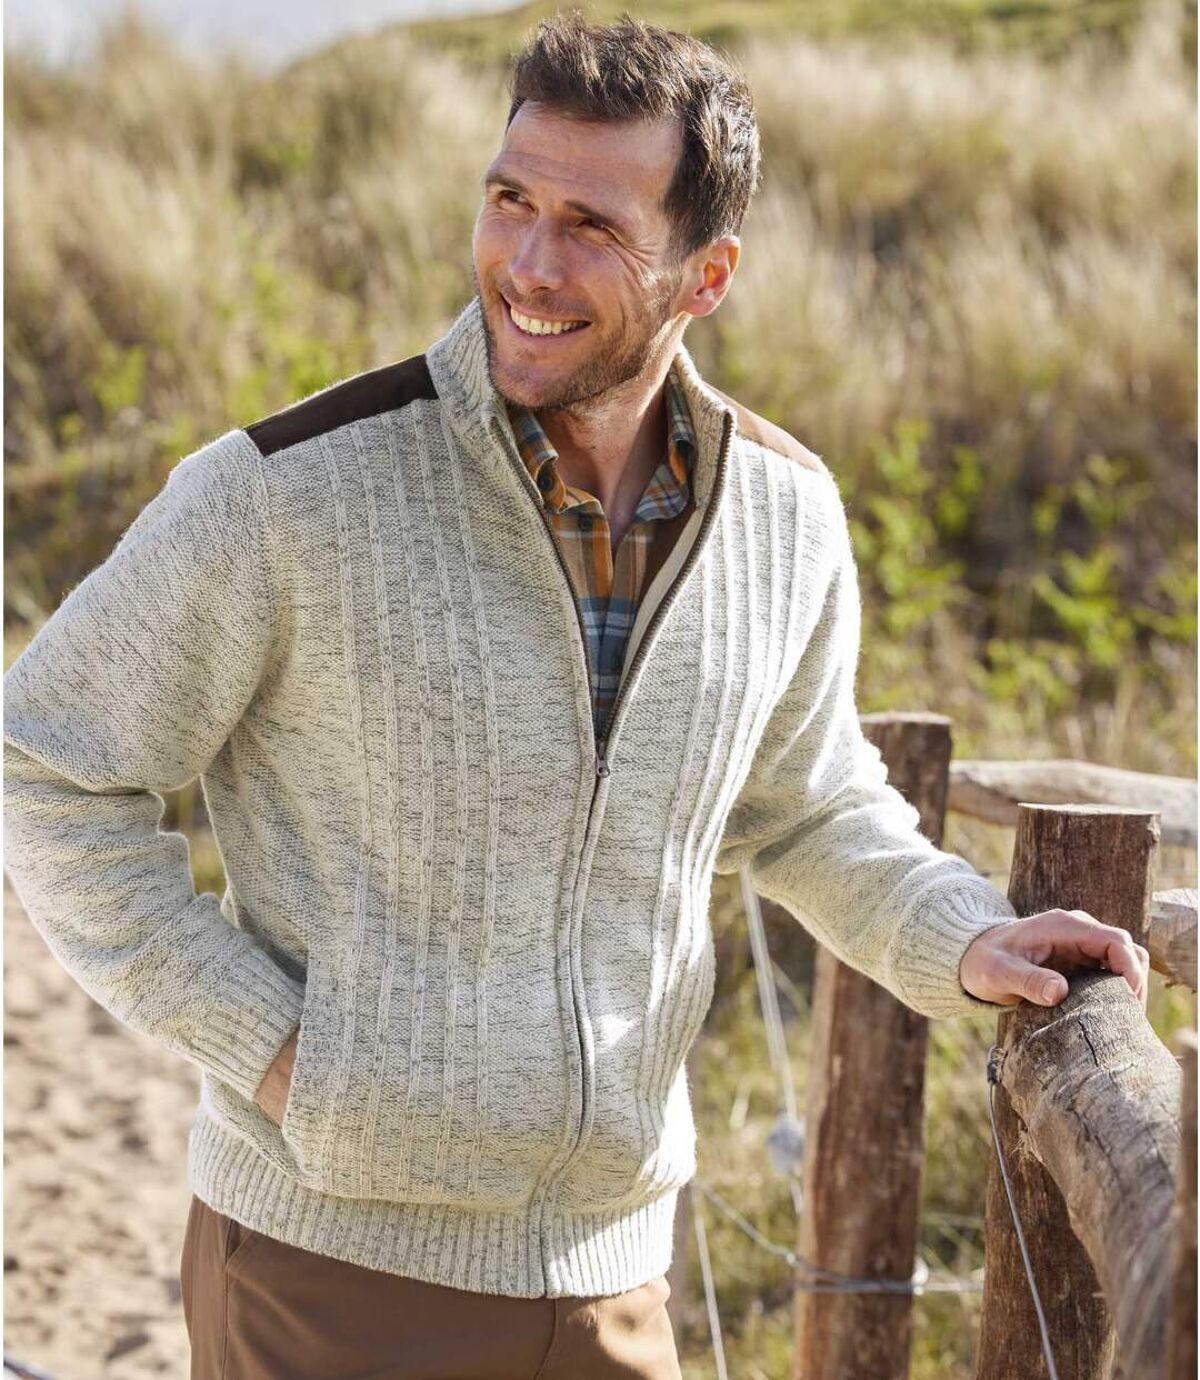 Men's Fleece-Lined Knitted Jacket - Beige Brown  Atlas For Men